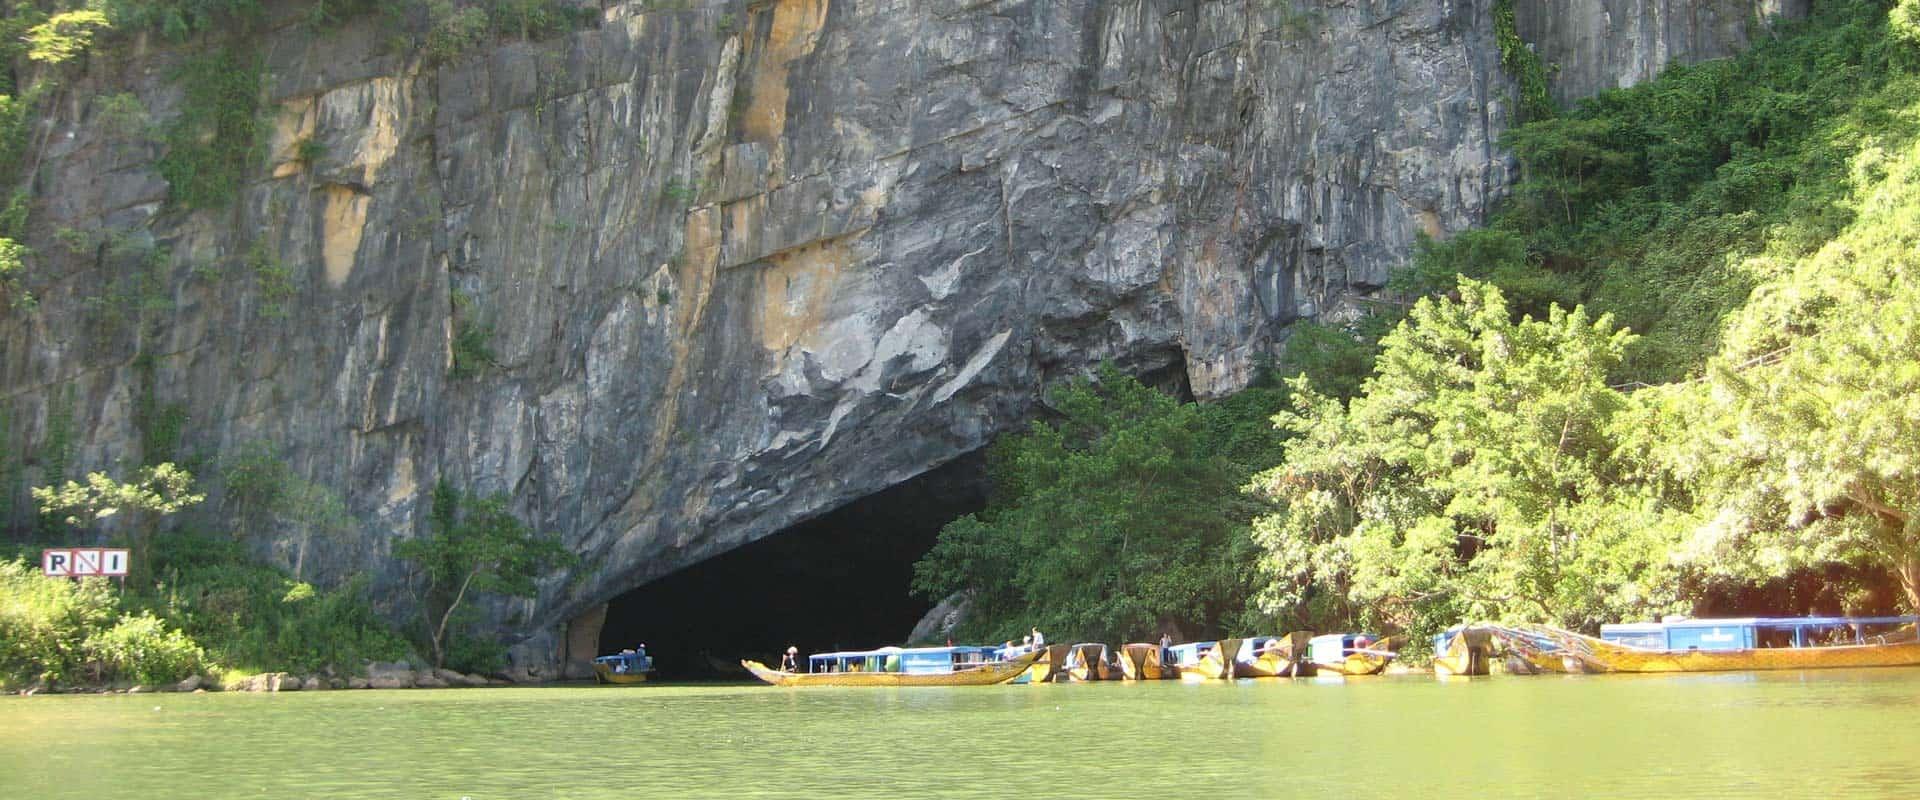 La grotte de Phong Nha